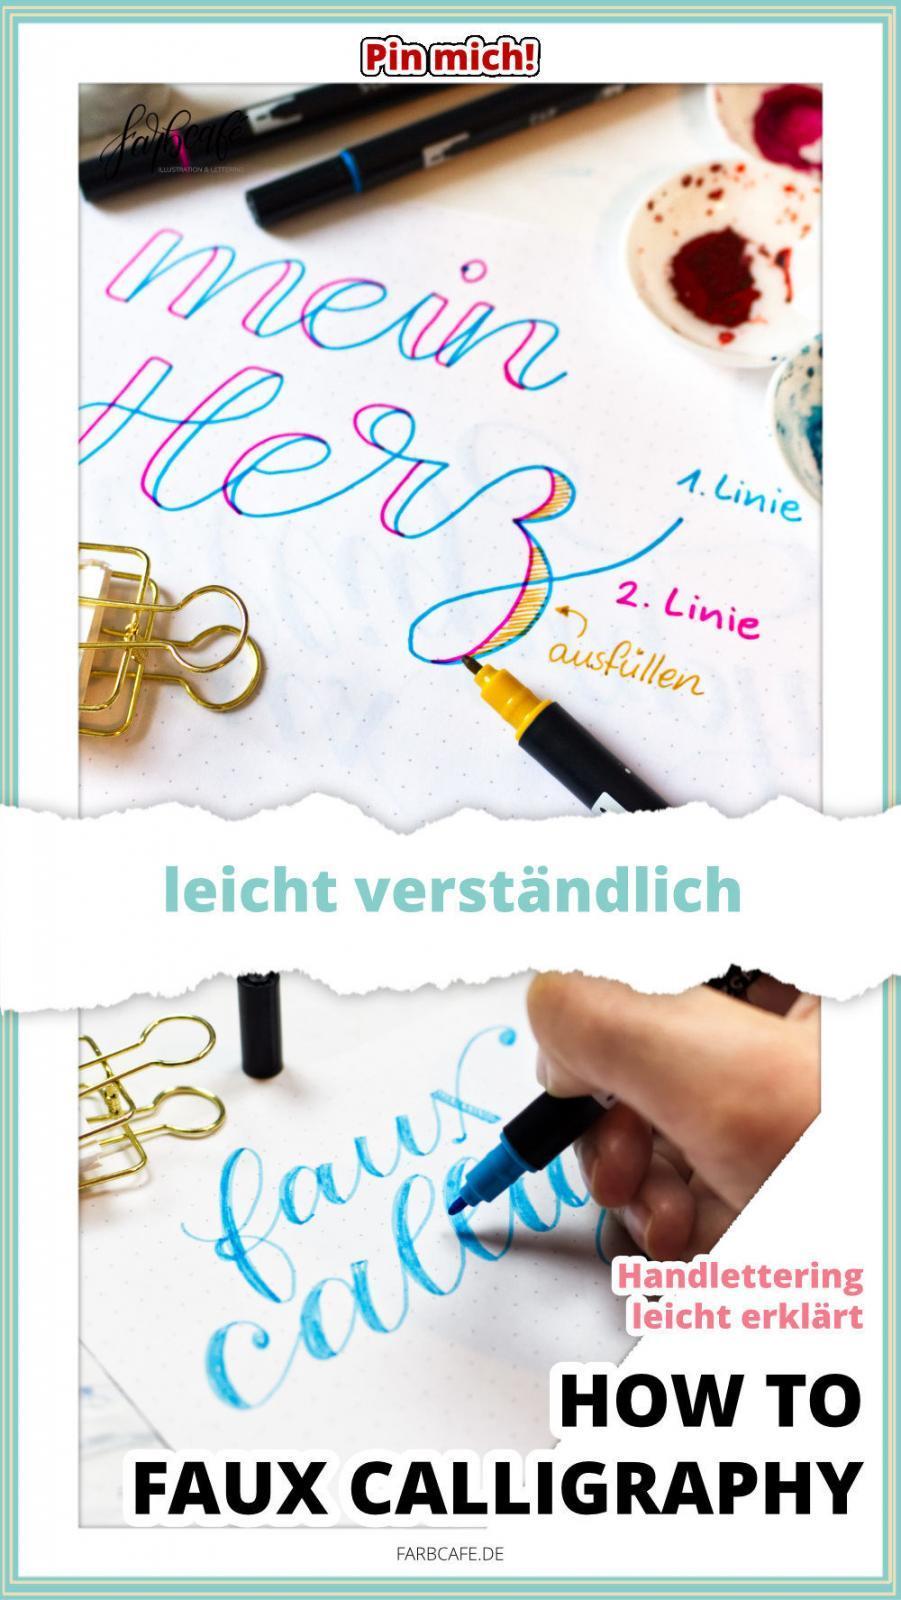 Faux Calligraphy leicht erklärt #handlettering